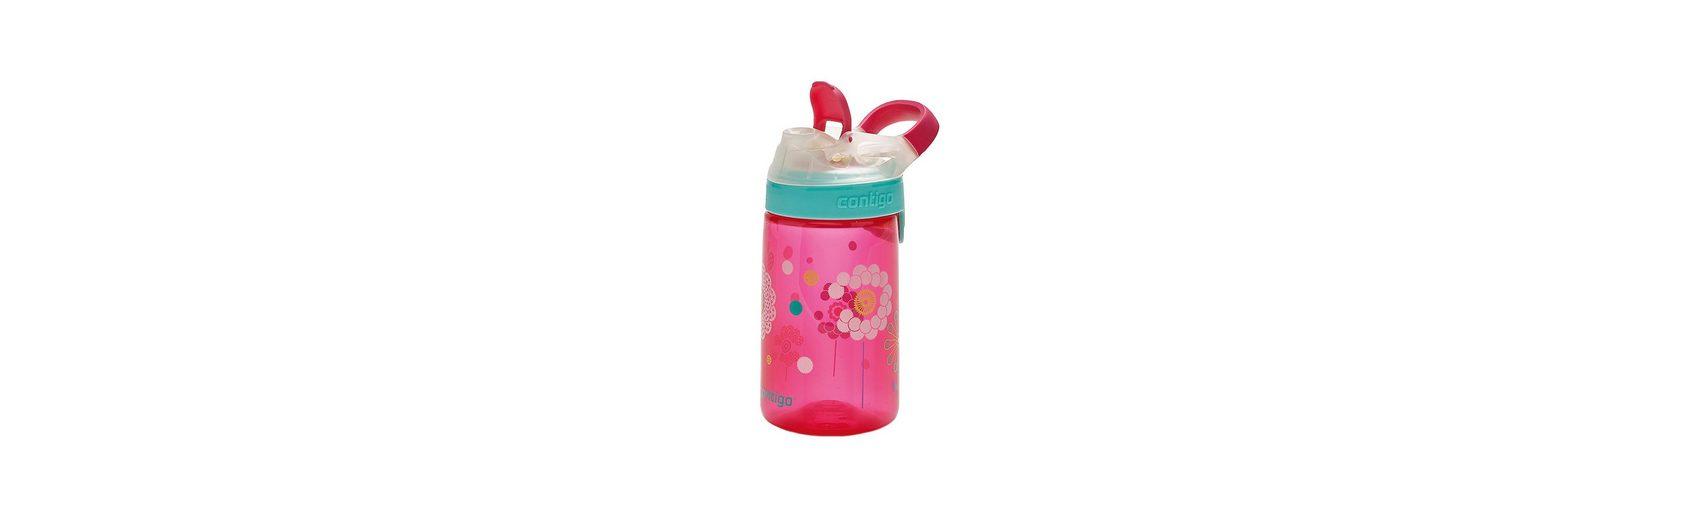 contigo Trinkflasche Gizmo Sip Cherry Blossom Dandelion, 420 ml